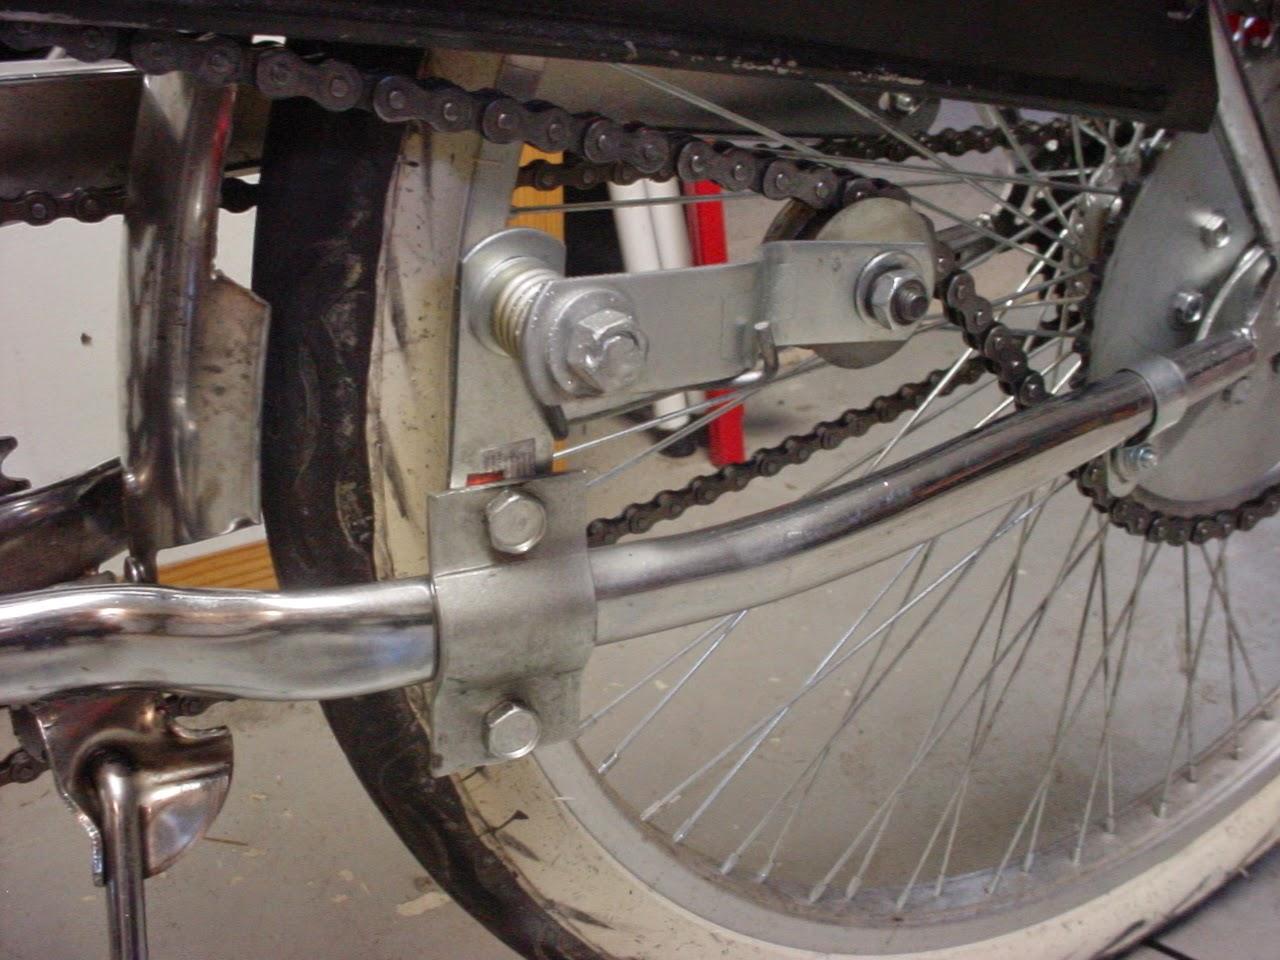 Motored Bicycle Hacks